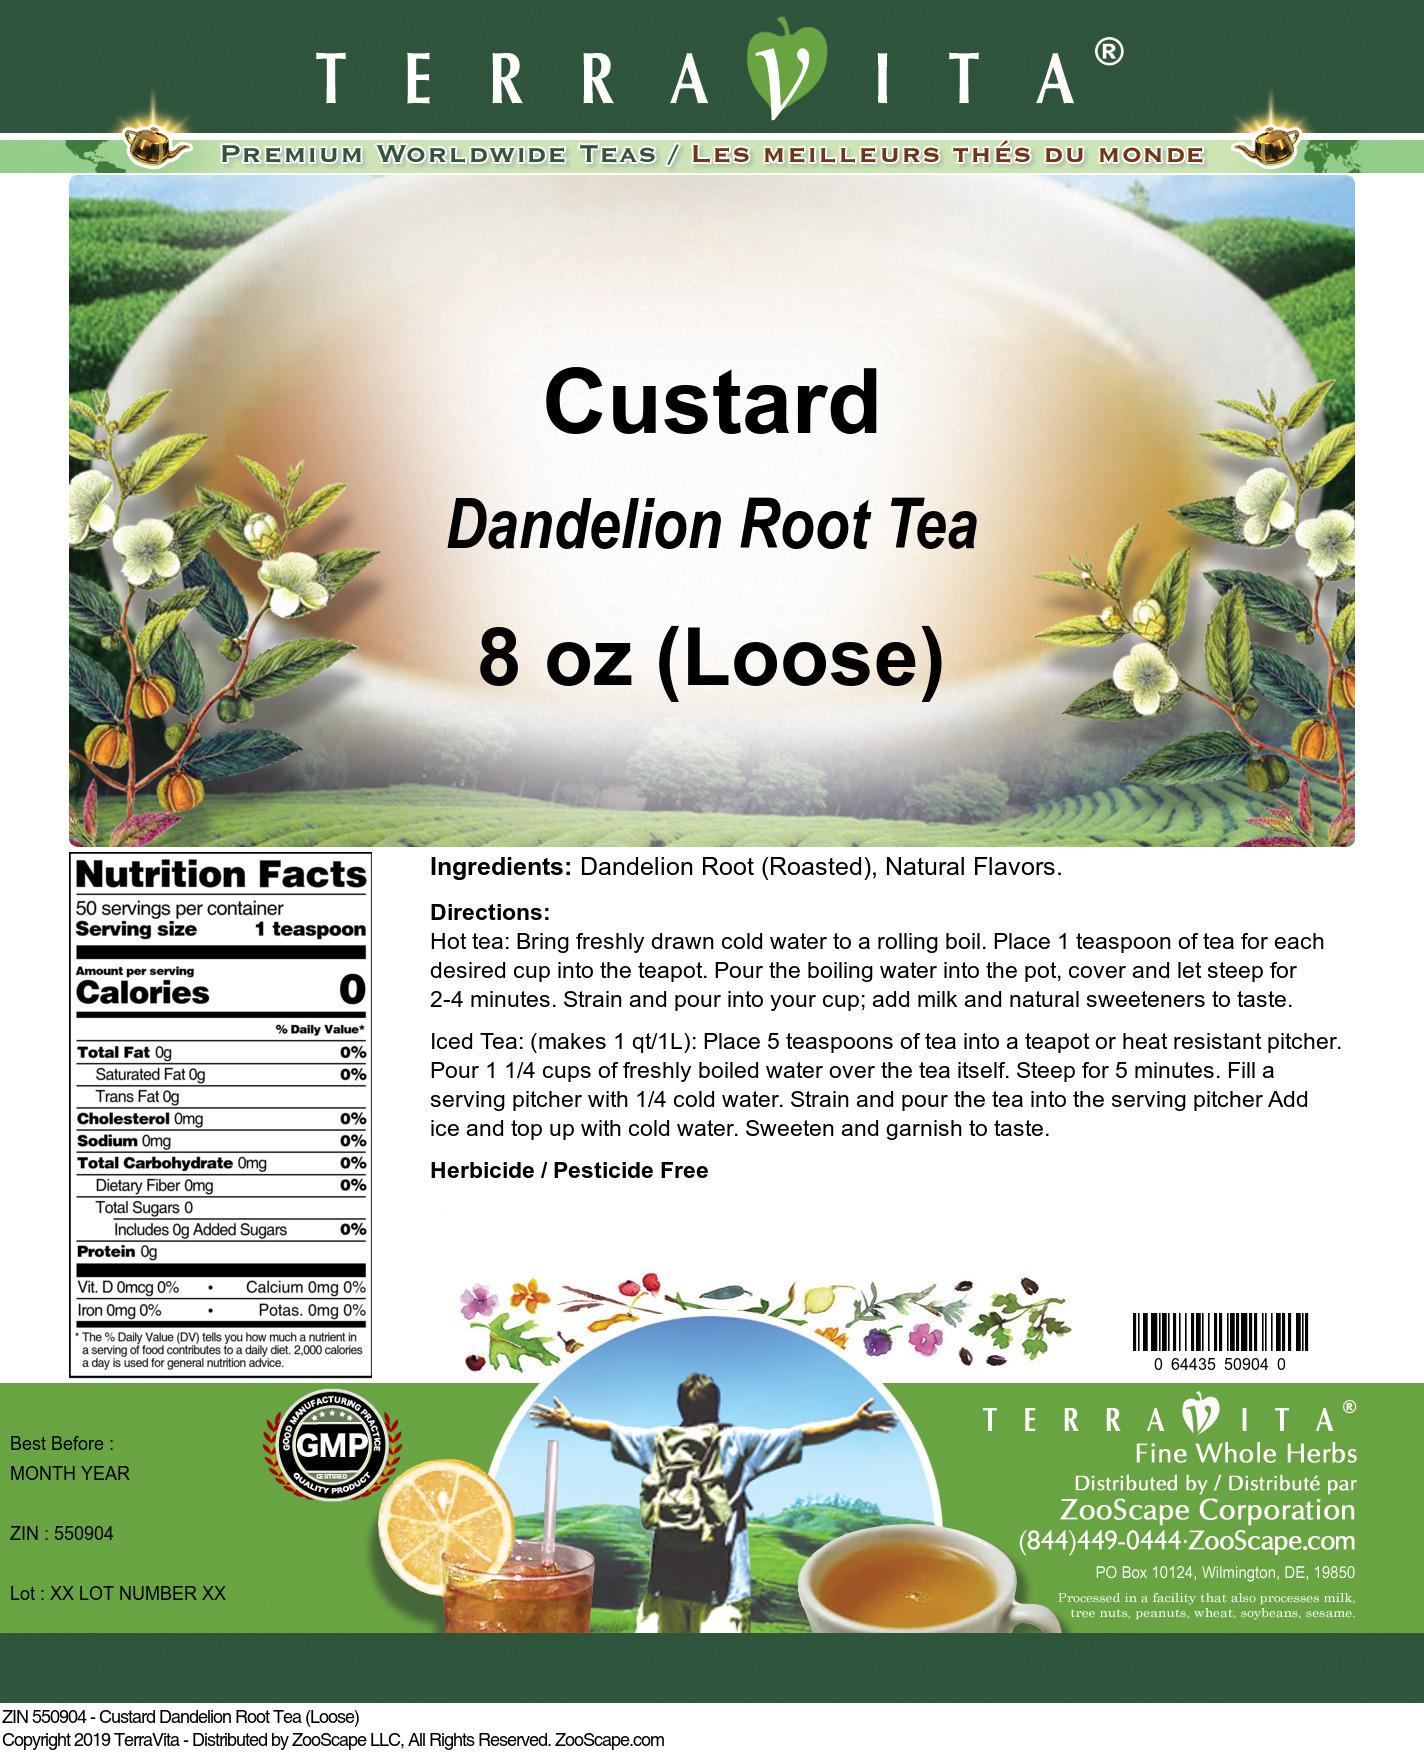 Custard Dandelion Root